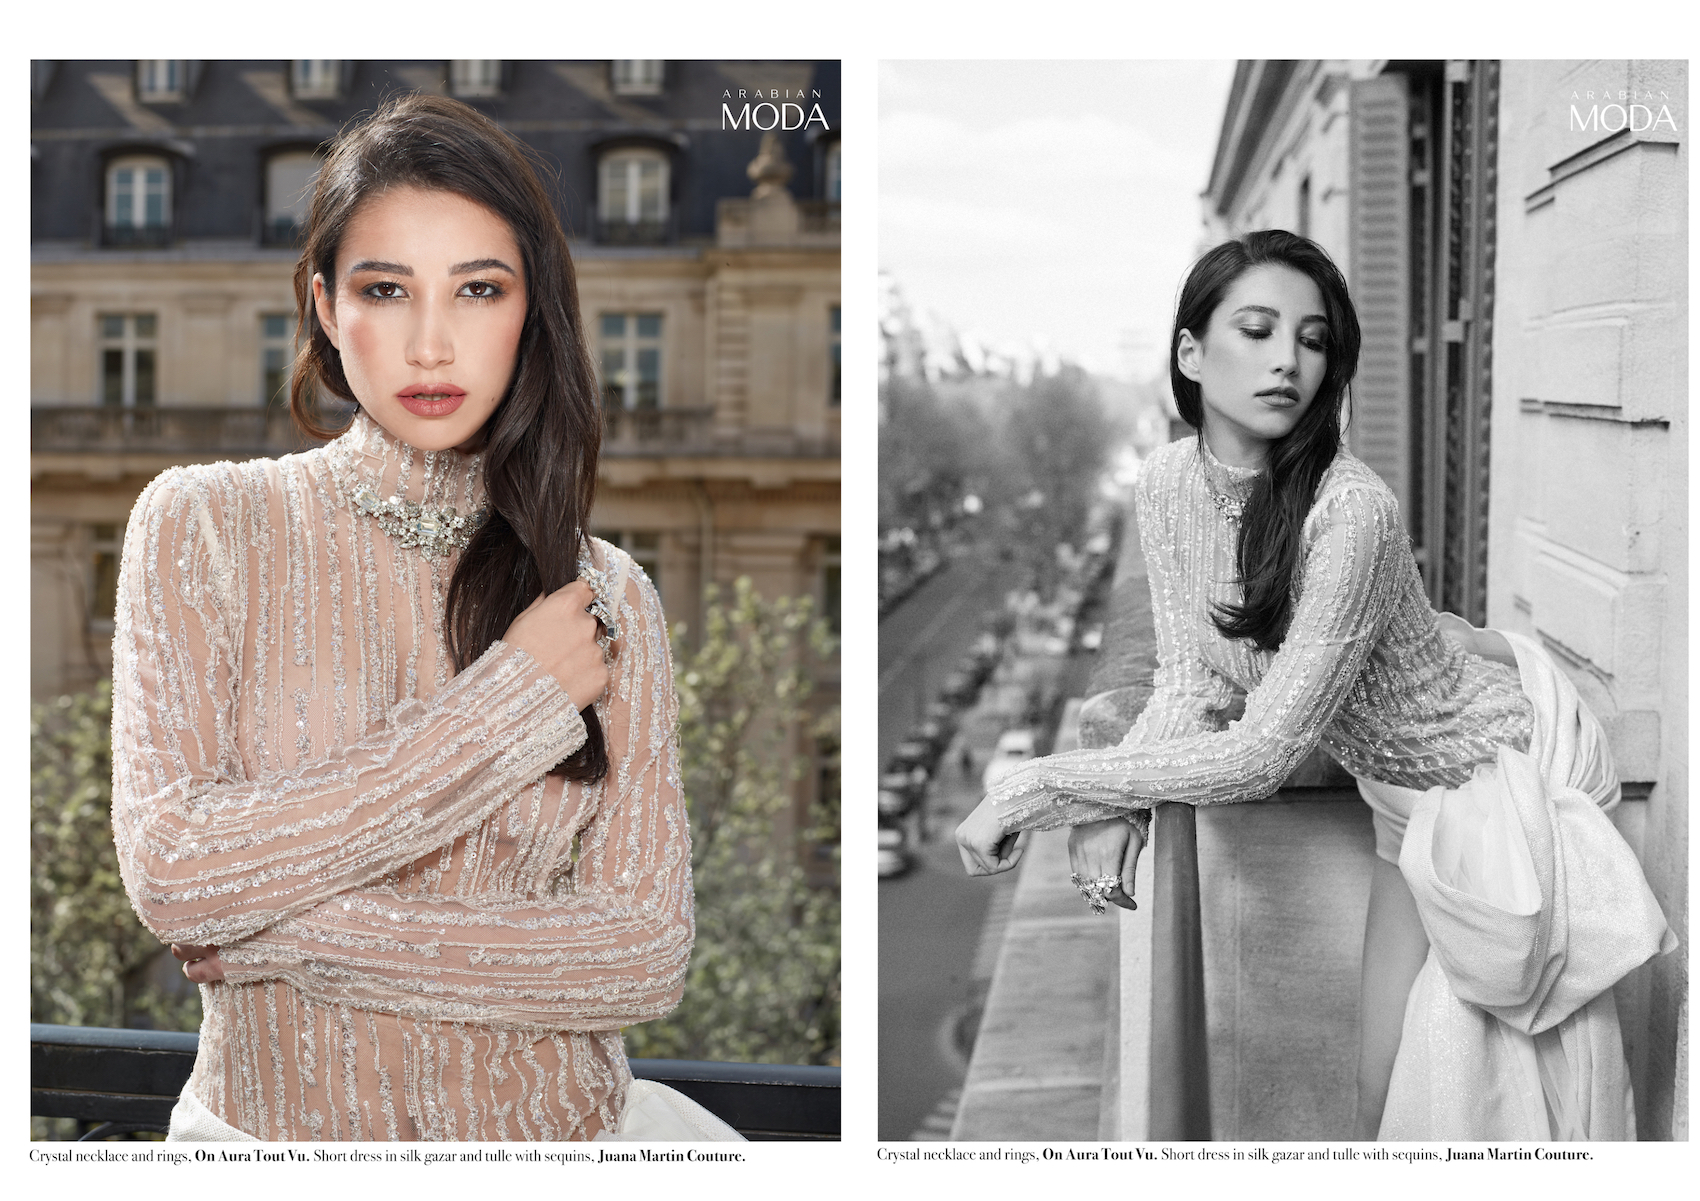 Arabian Moda x Juana Martin x On Aura Tout Vu-2